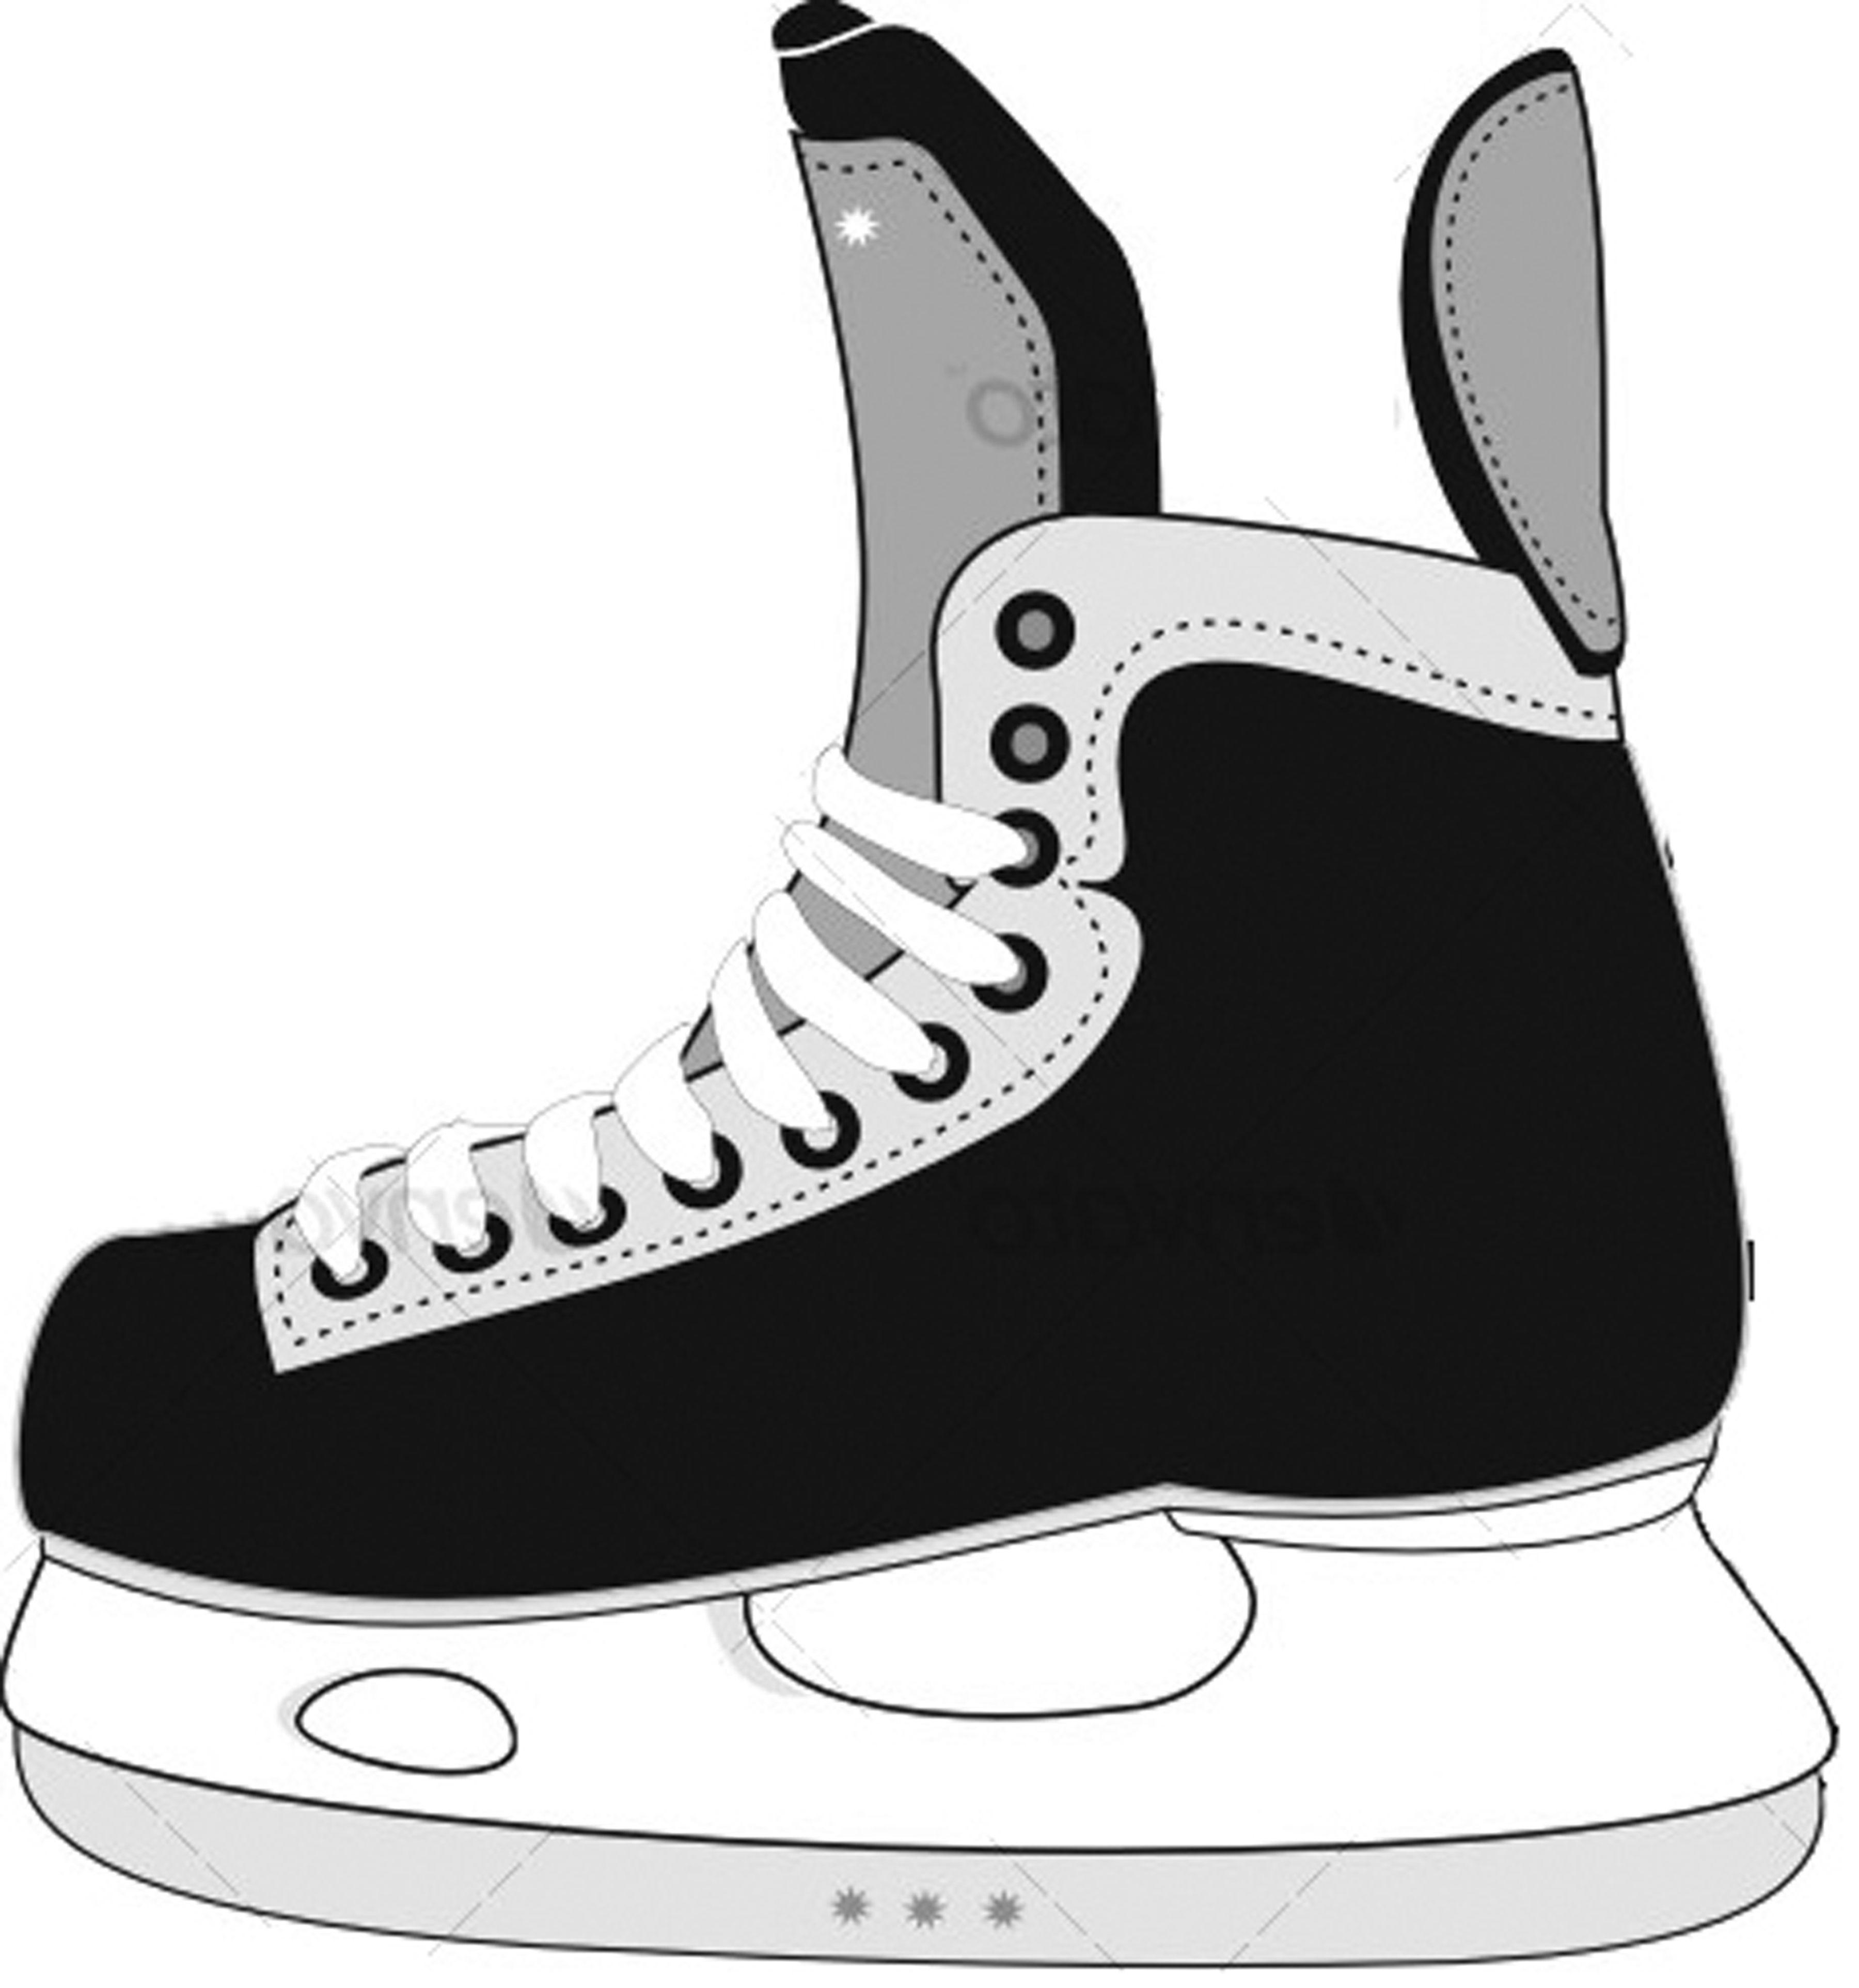 small resolution of hockey clipart hockey tournament 663